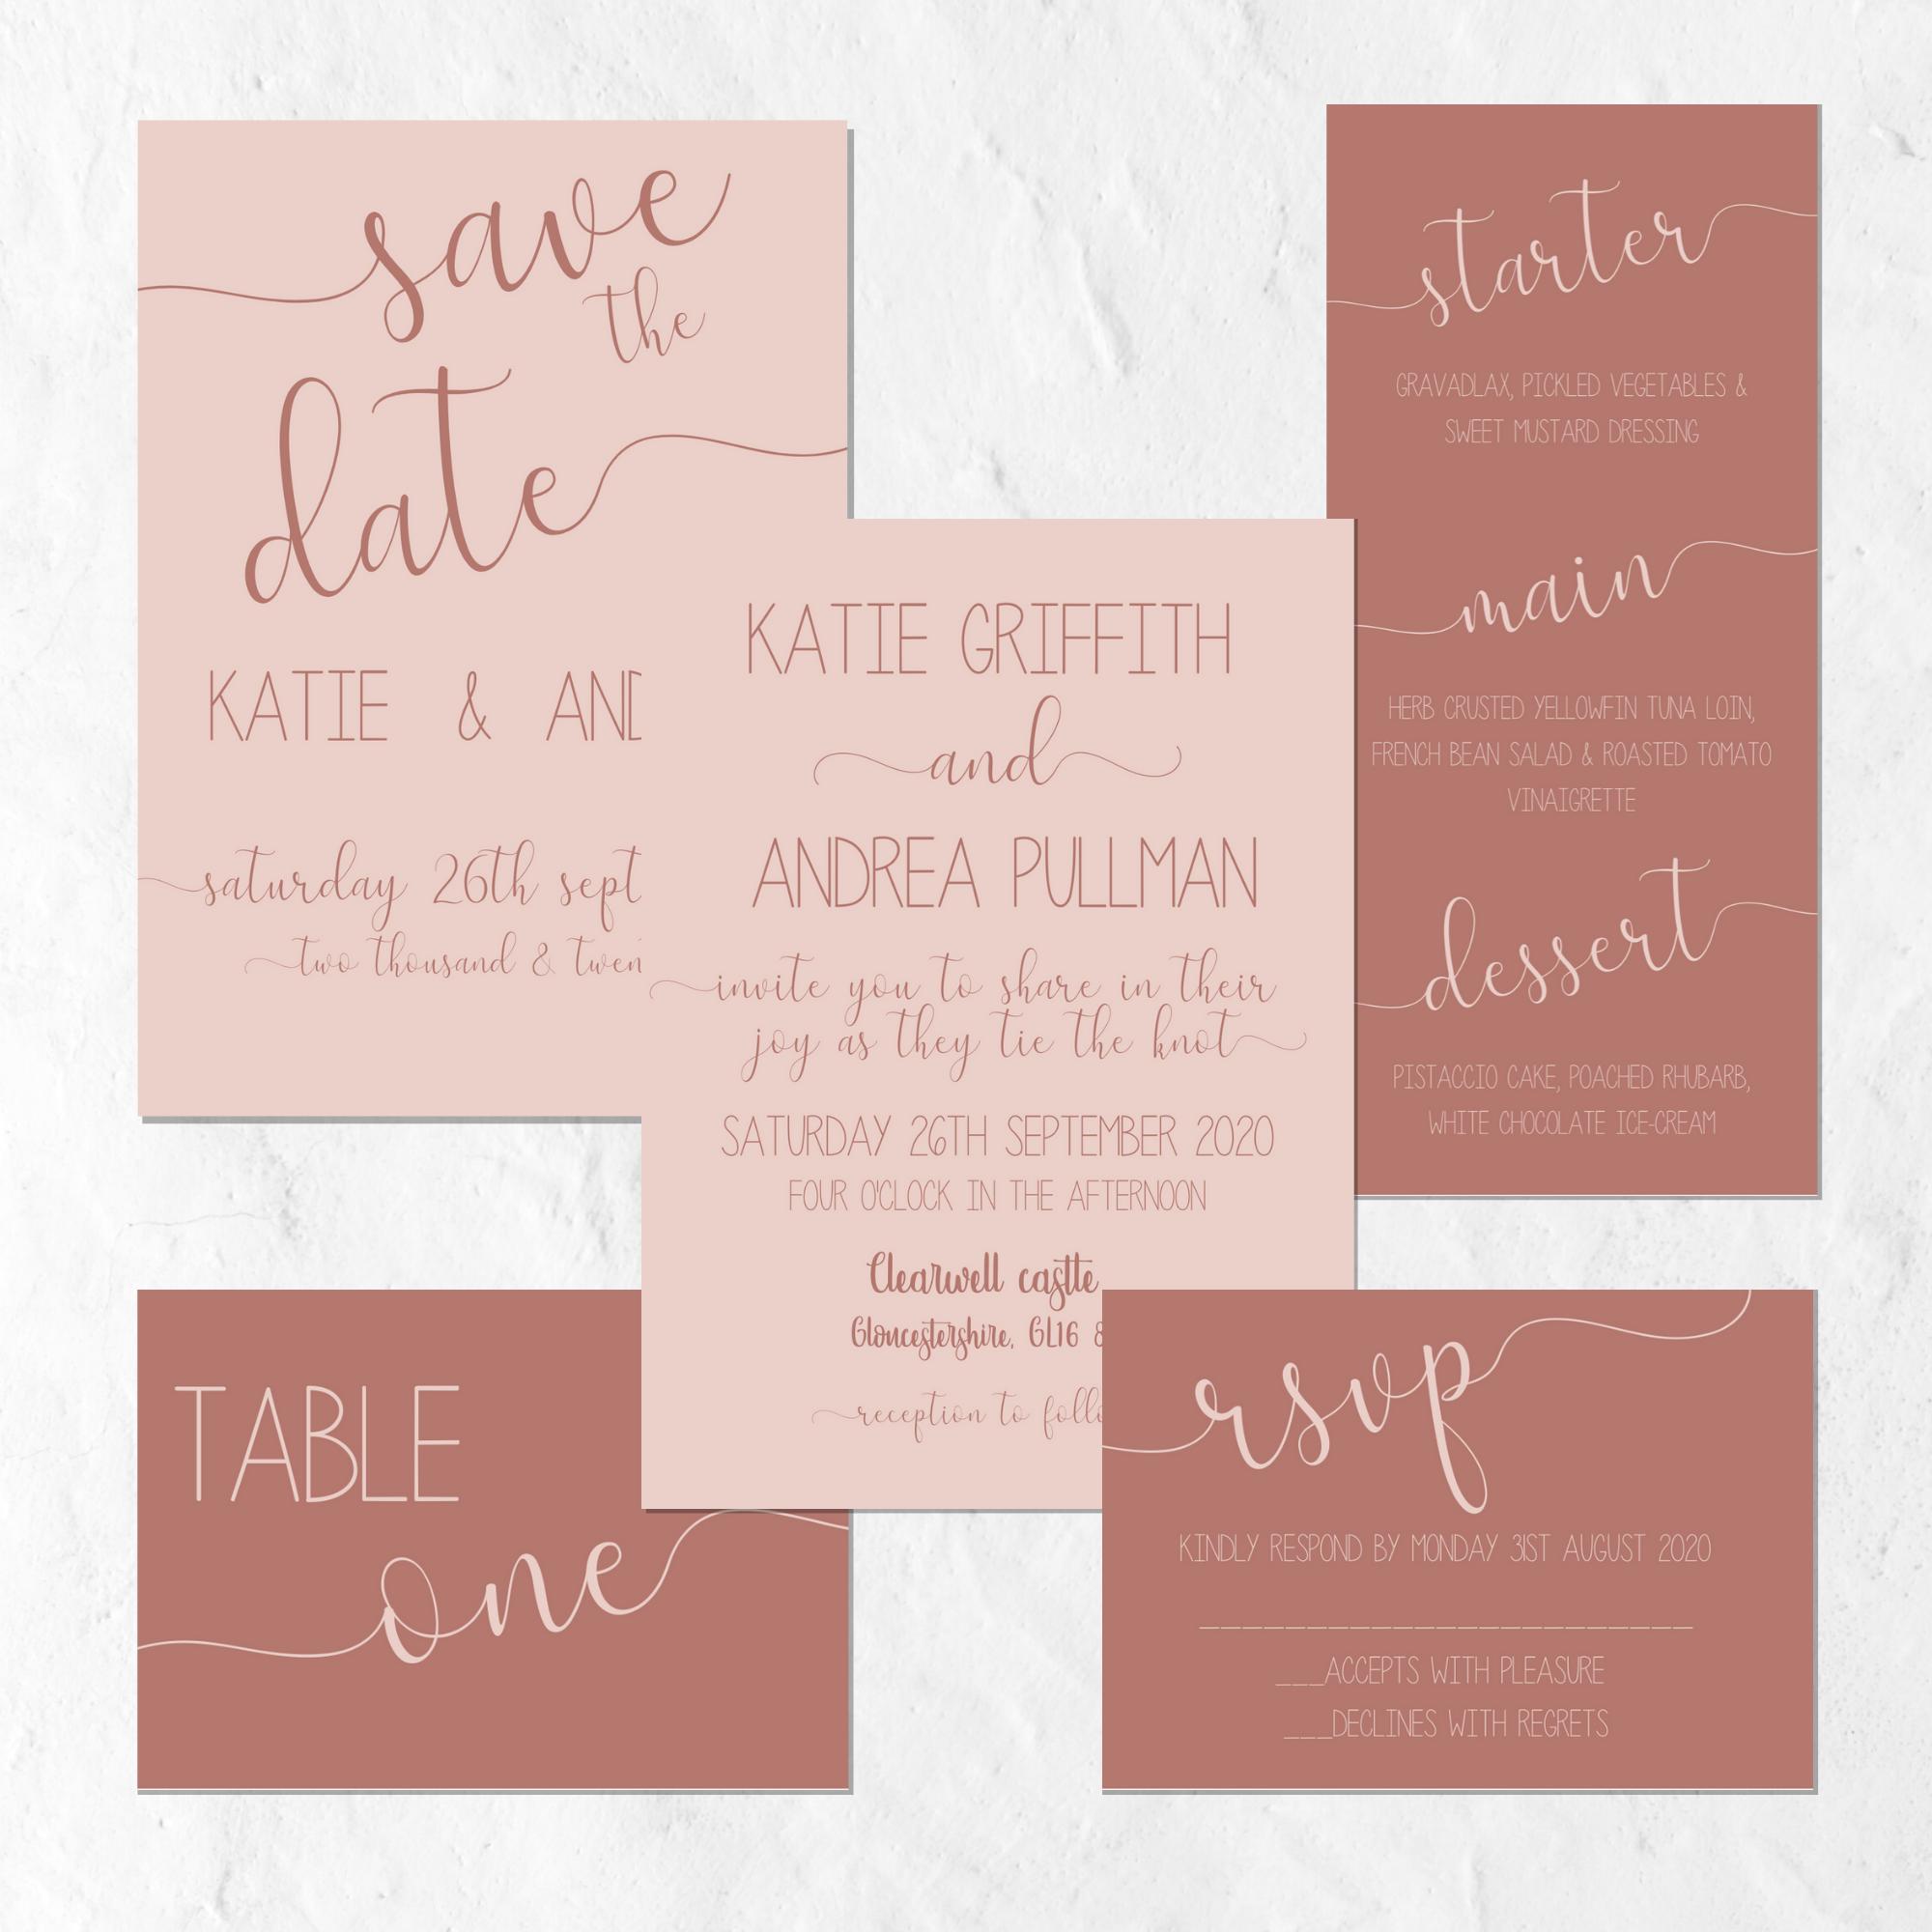 dusty pink & brown wedding invitation suite